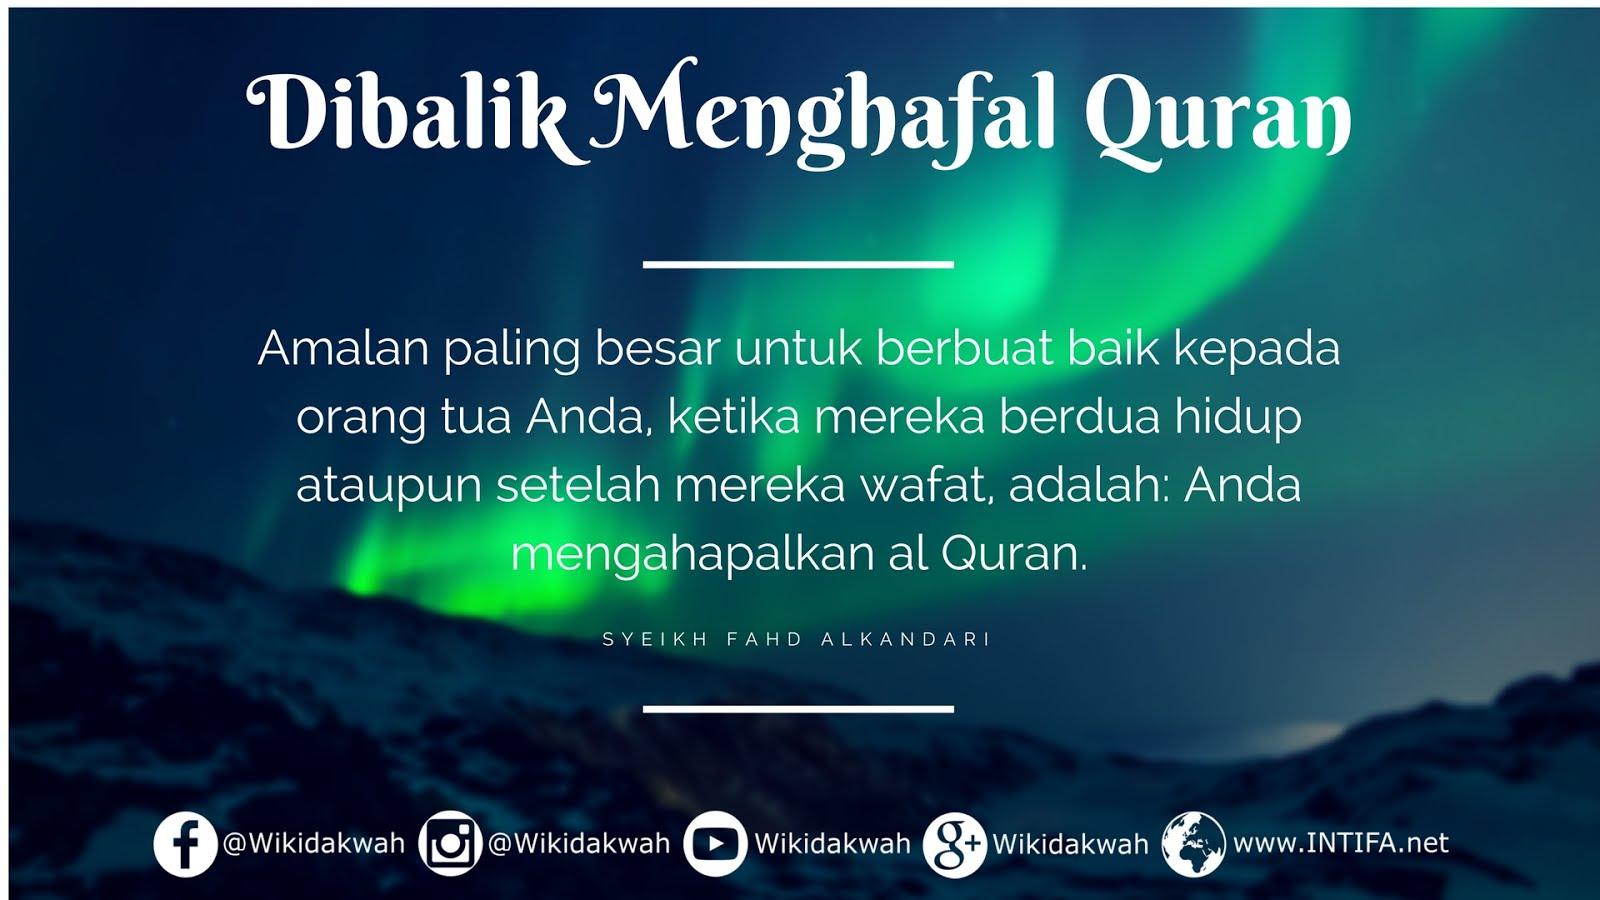 Kata Kata Motivasi Menghafal Quran Cikimm Com